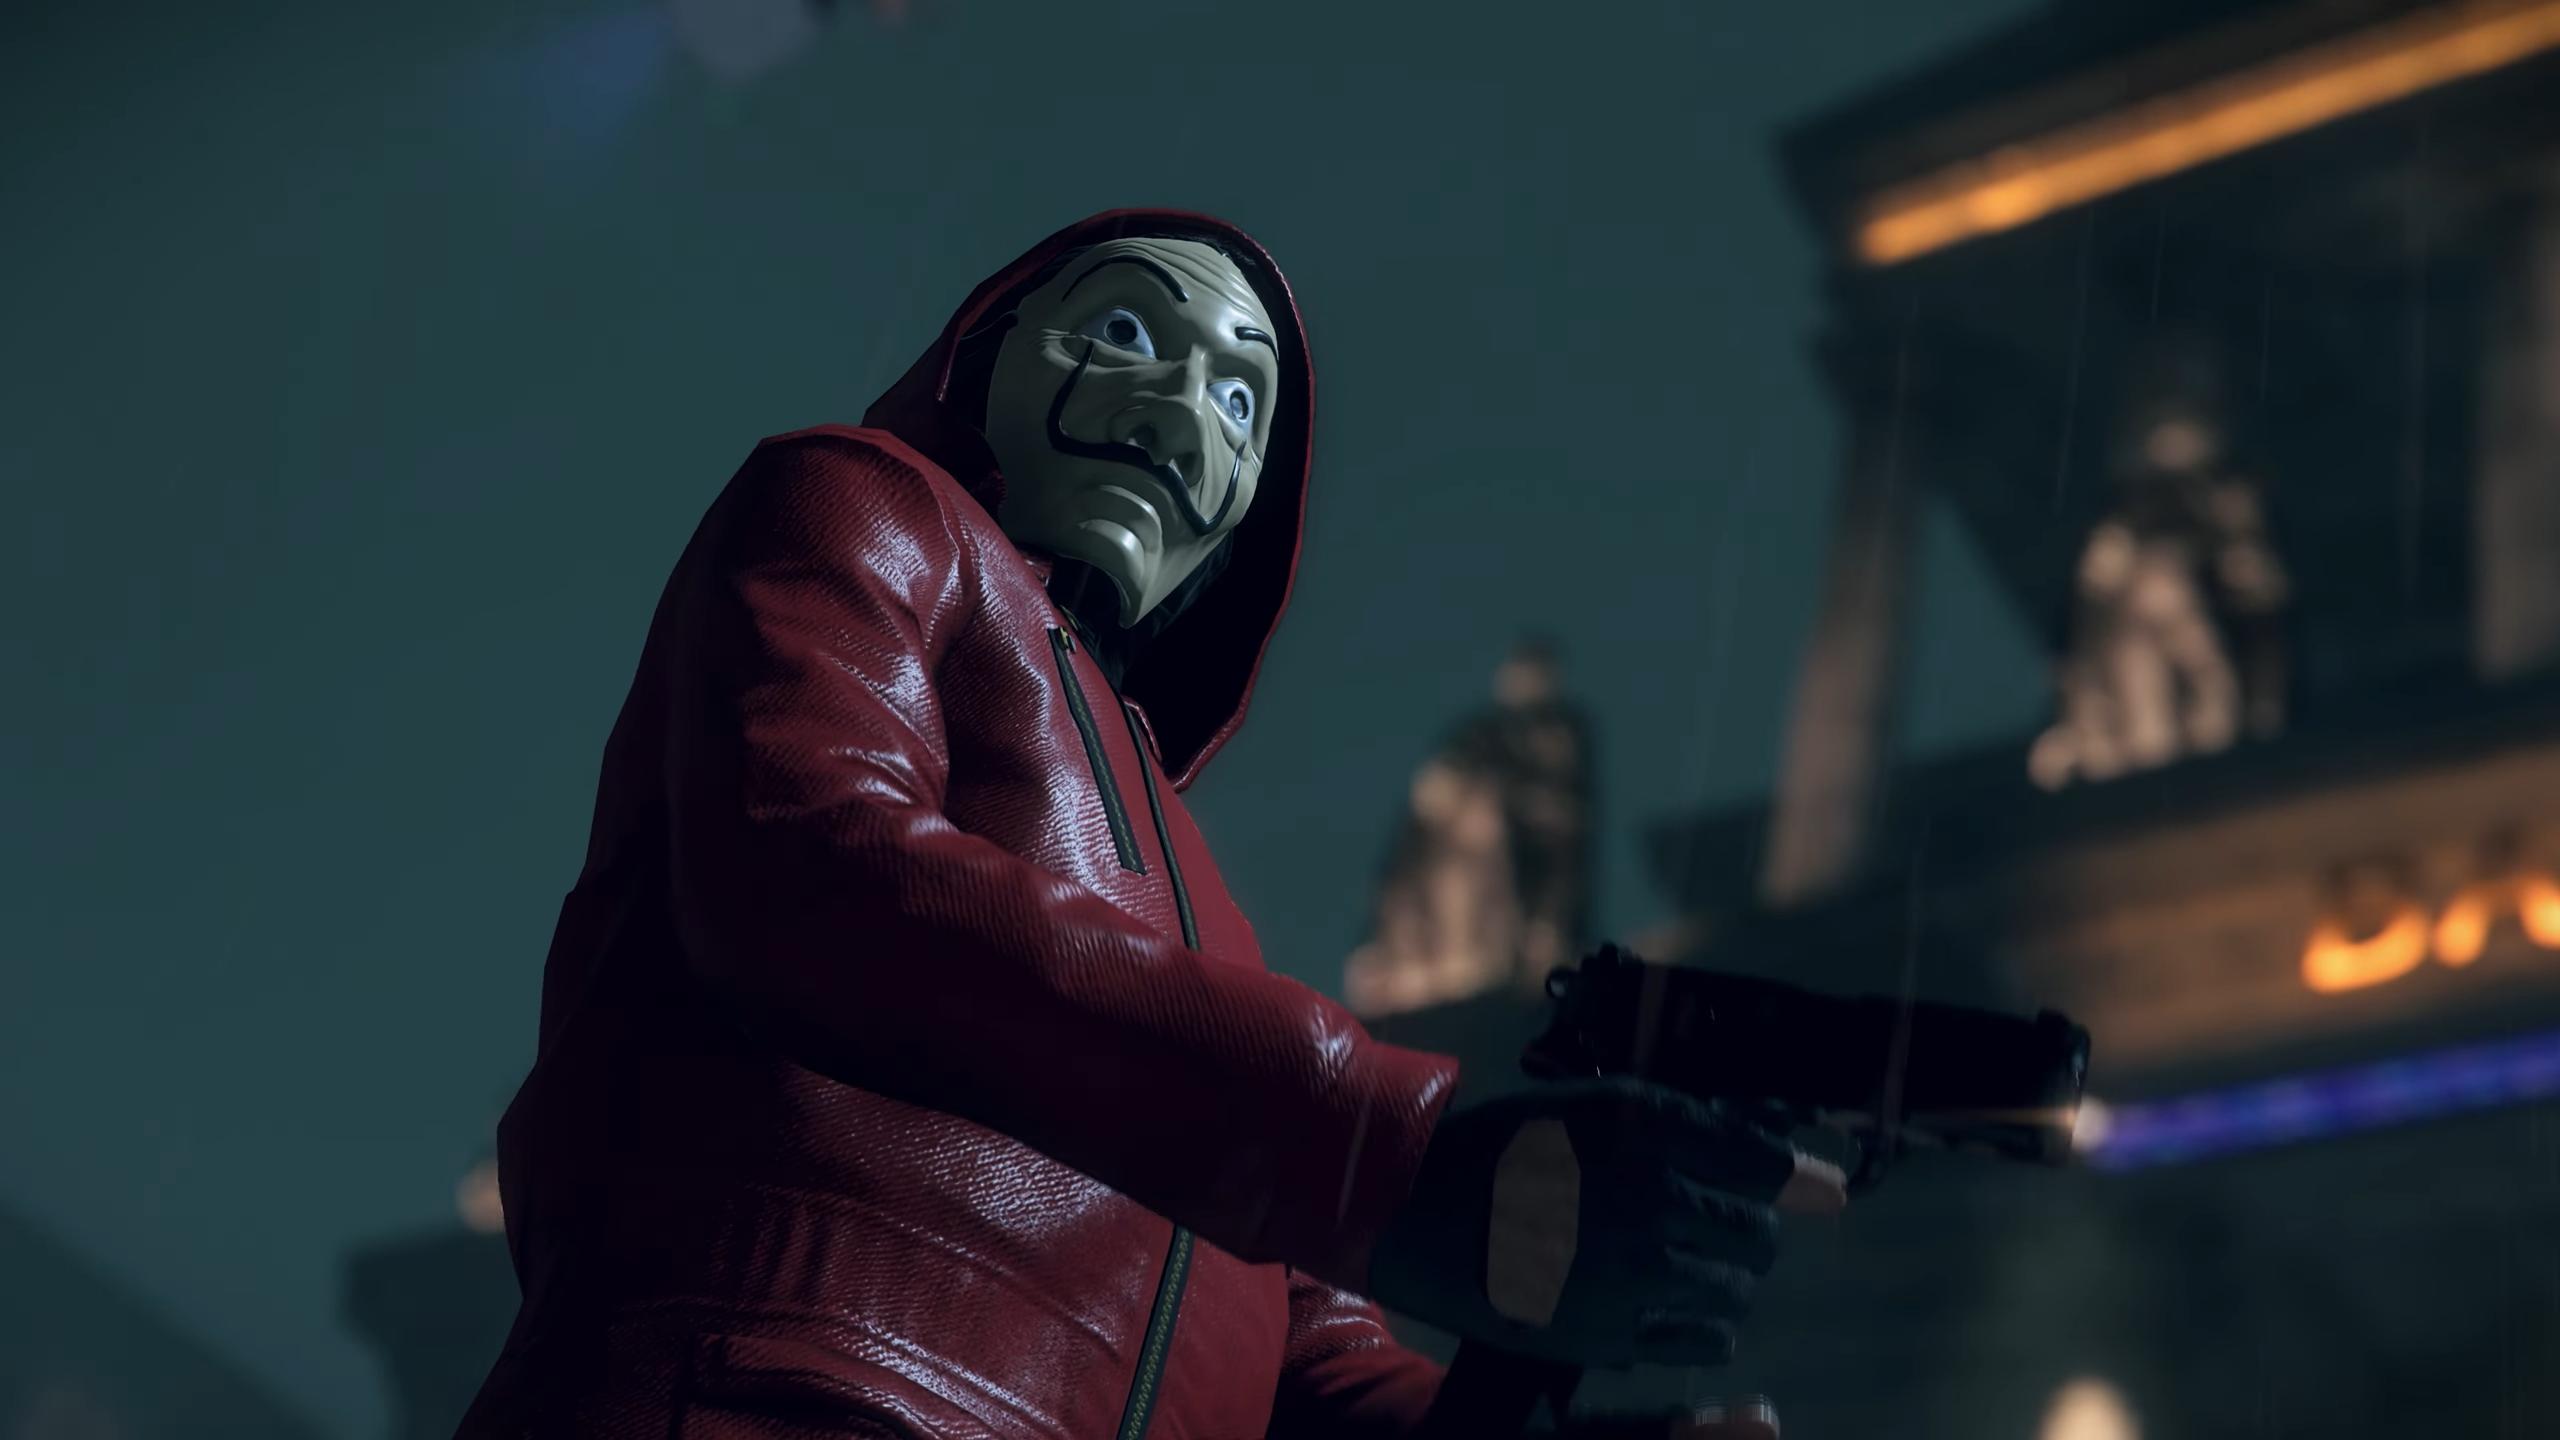 Watch Dogs: Legion Money Heist crossover mission